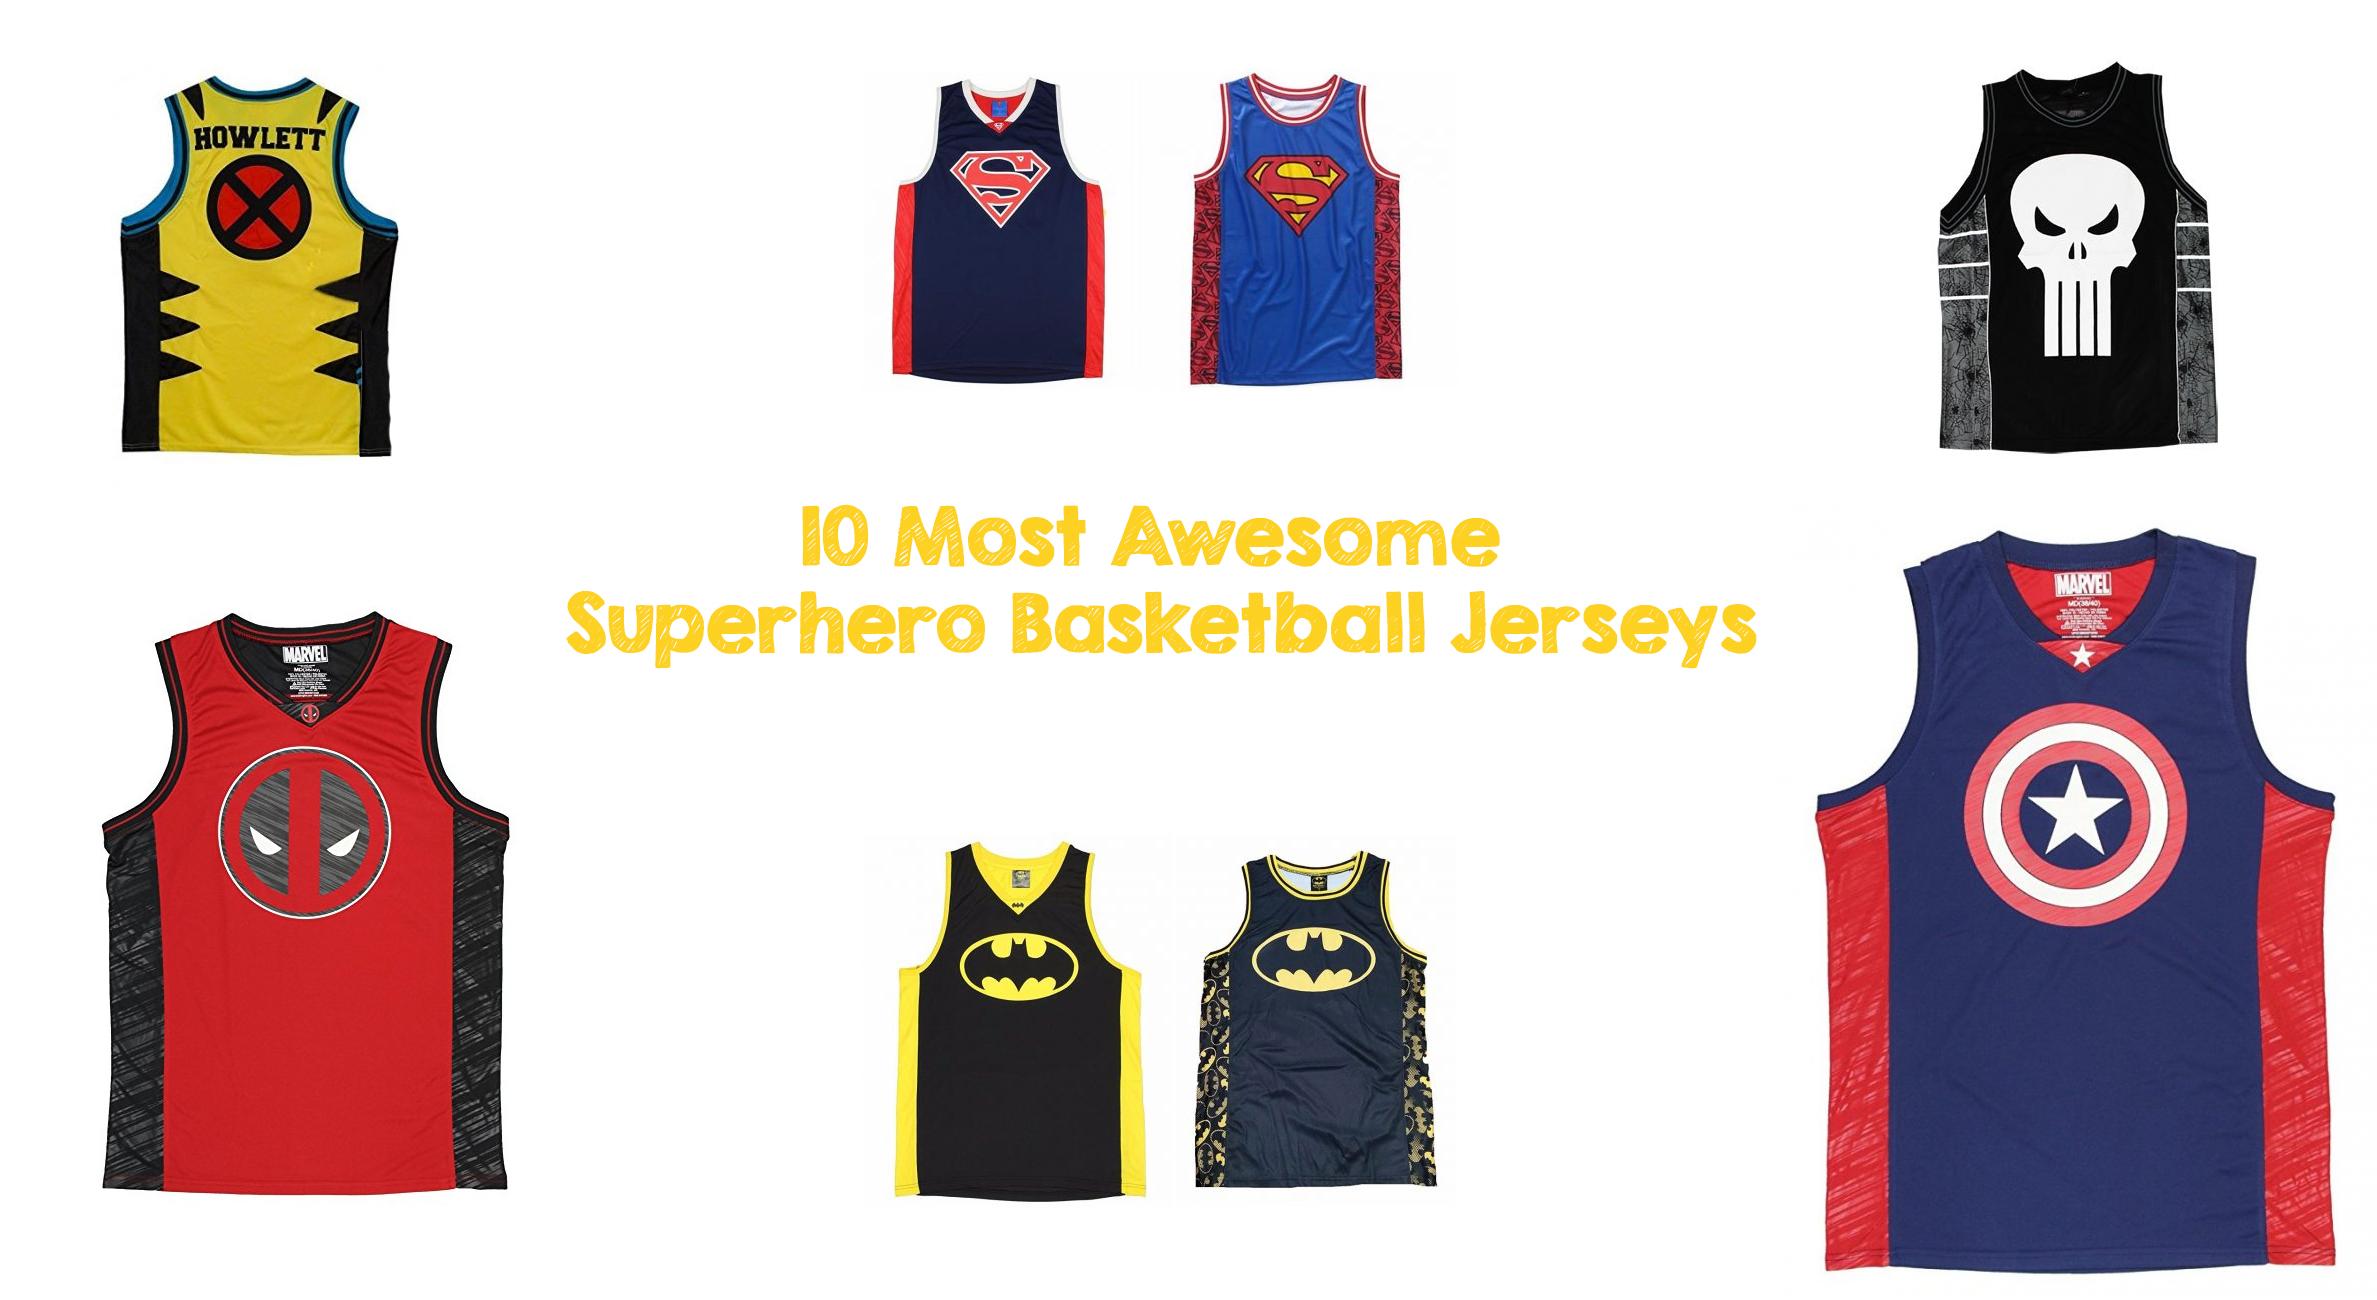 10 Most Awesome Superhero Basketball Jerseys